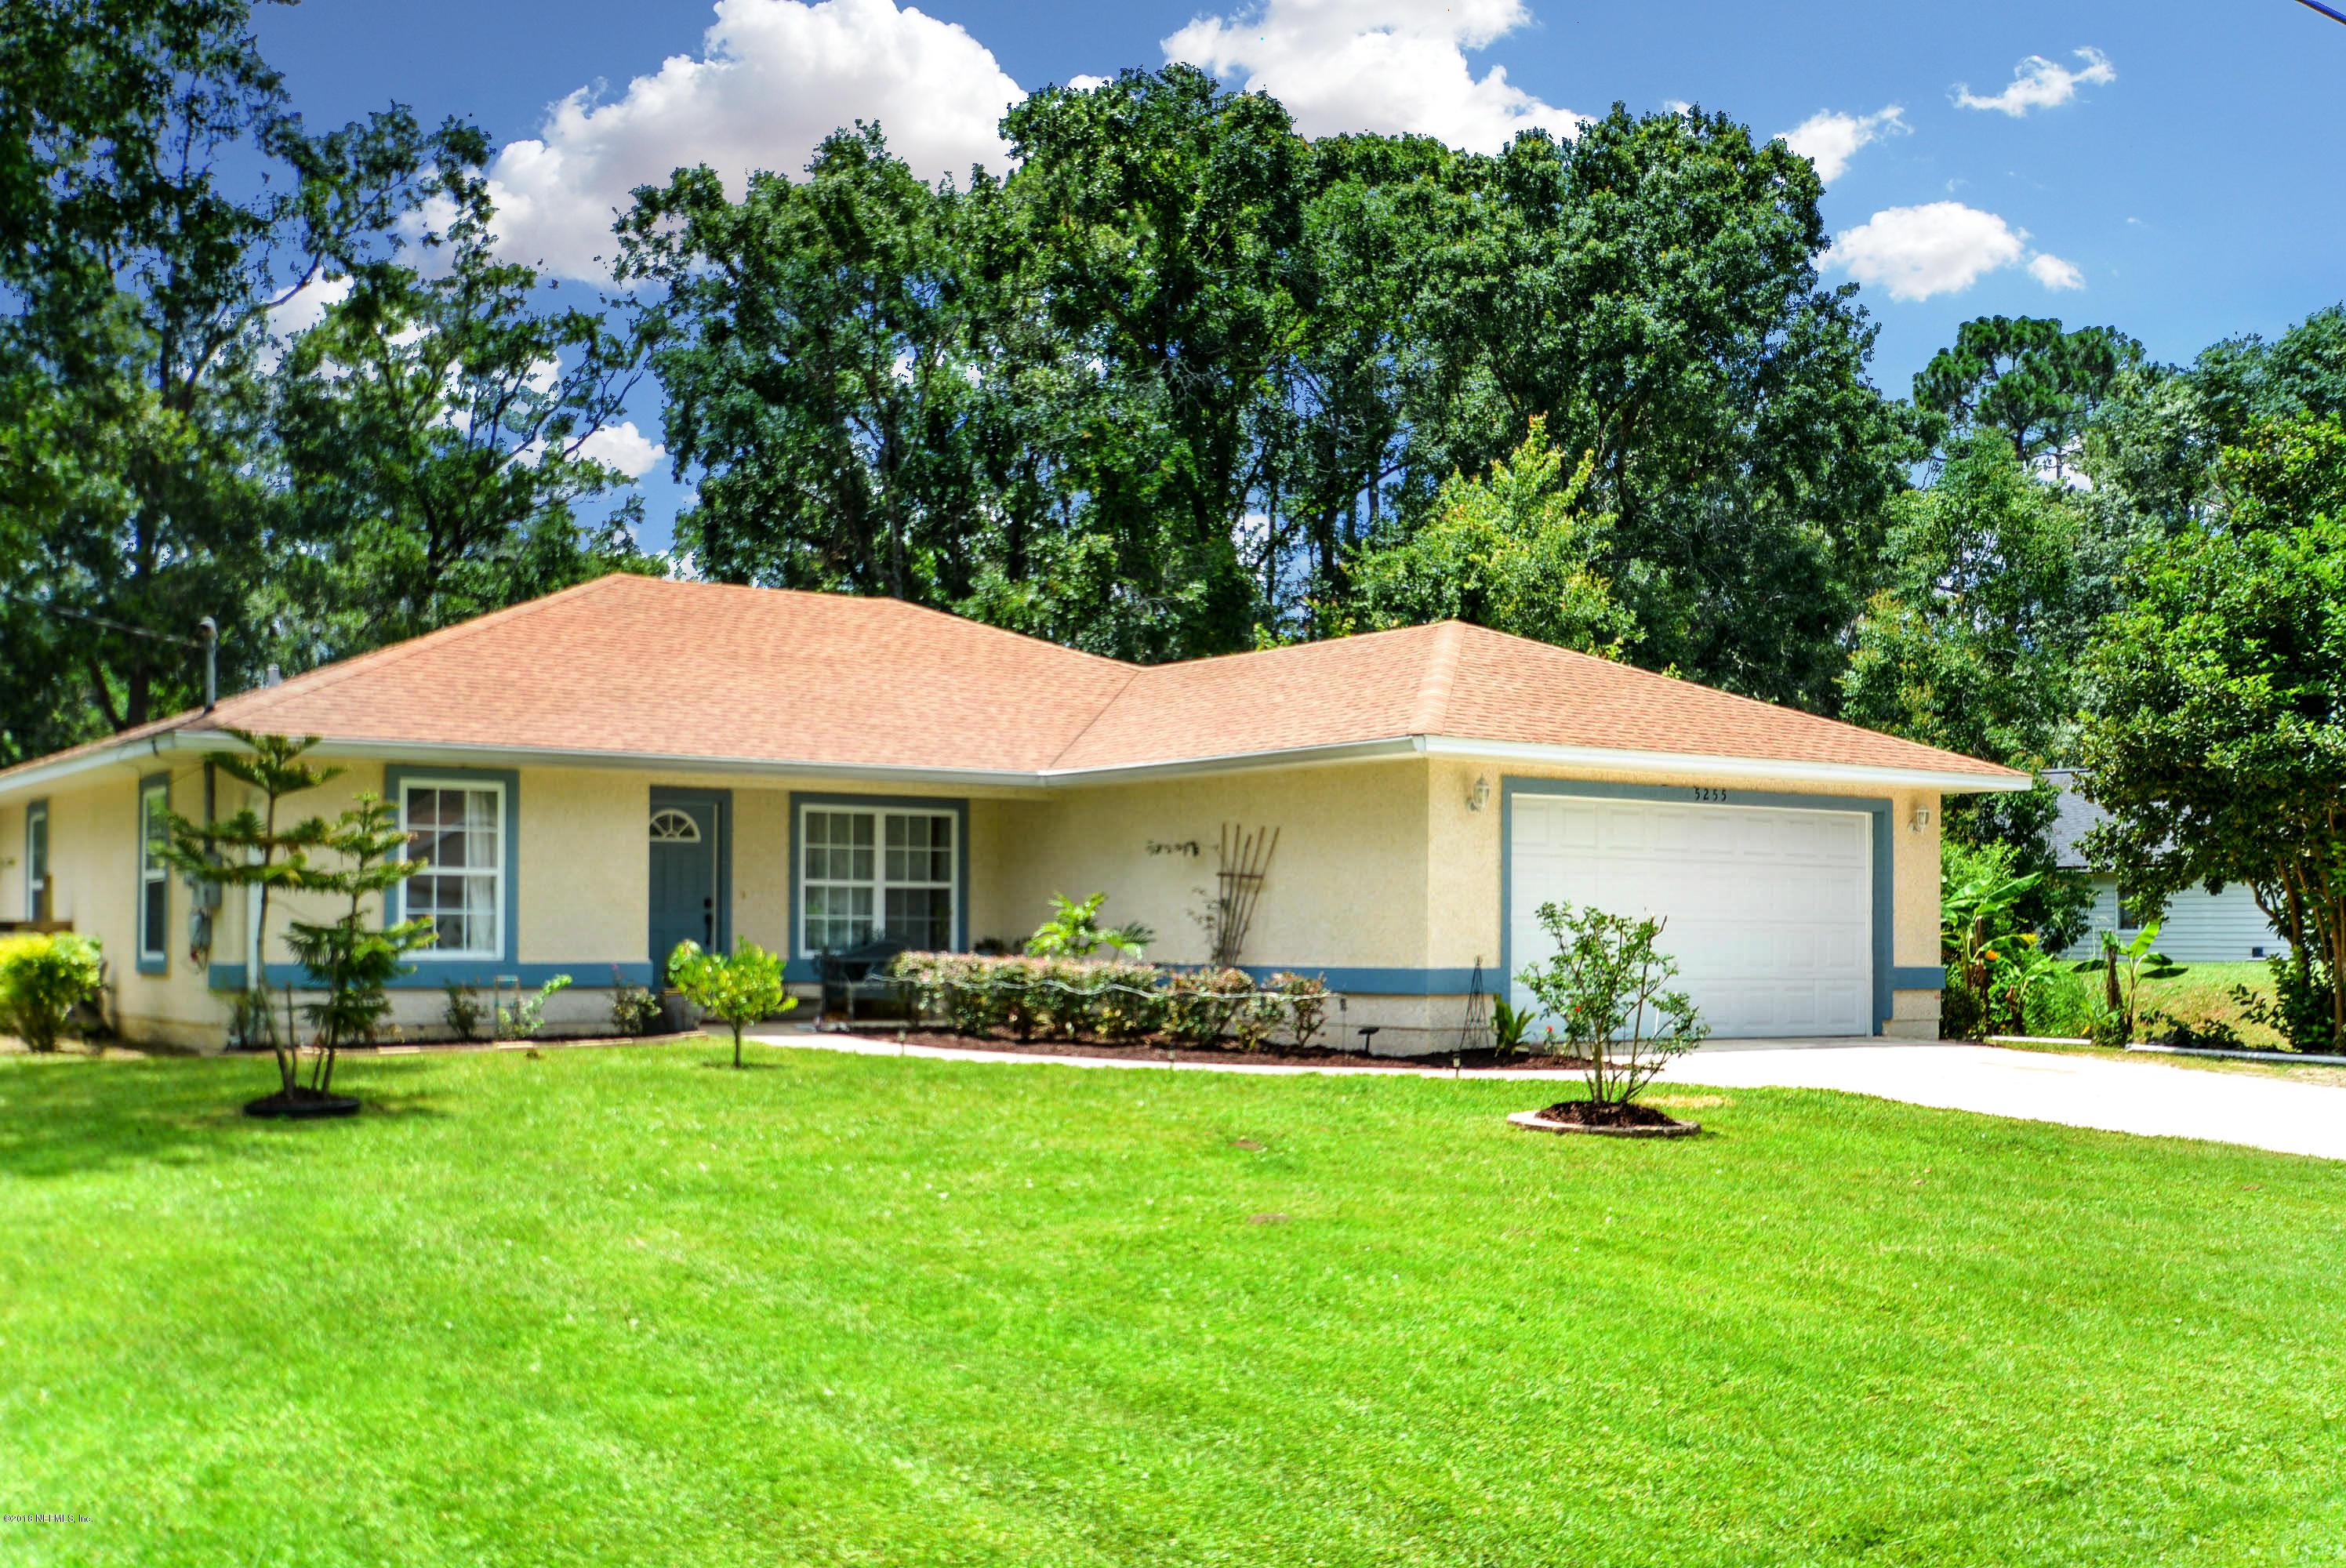 5255 ELLEN, ST AUGUSTINE, FLORIDA 32086, 3 Bedrooms Bedrooms, ,2 BathroomsBathrooms,Residential - single family,For sale,ELLEN,957506